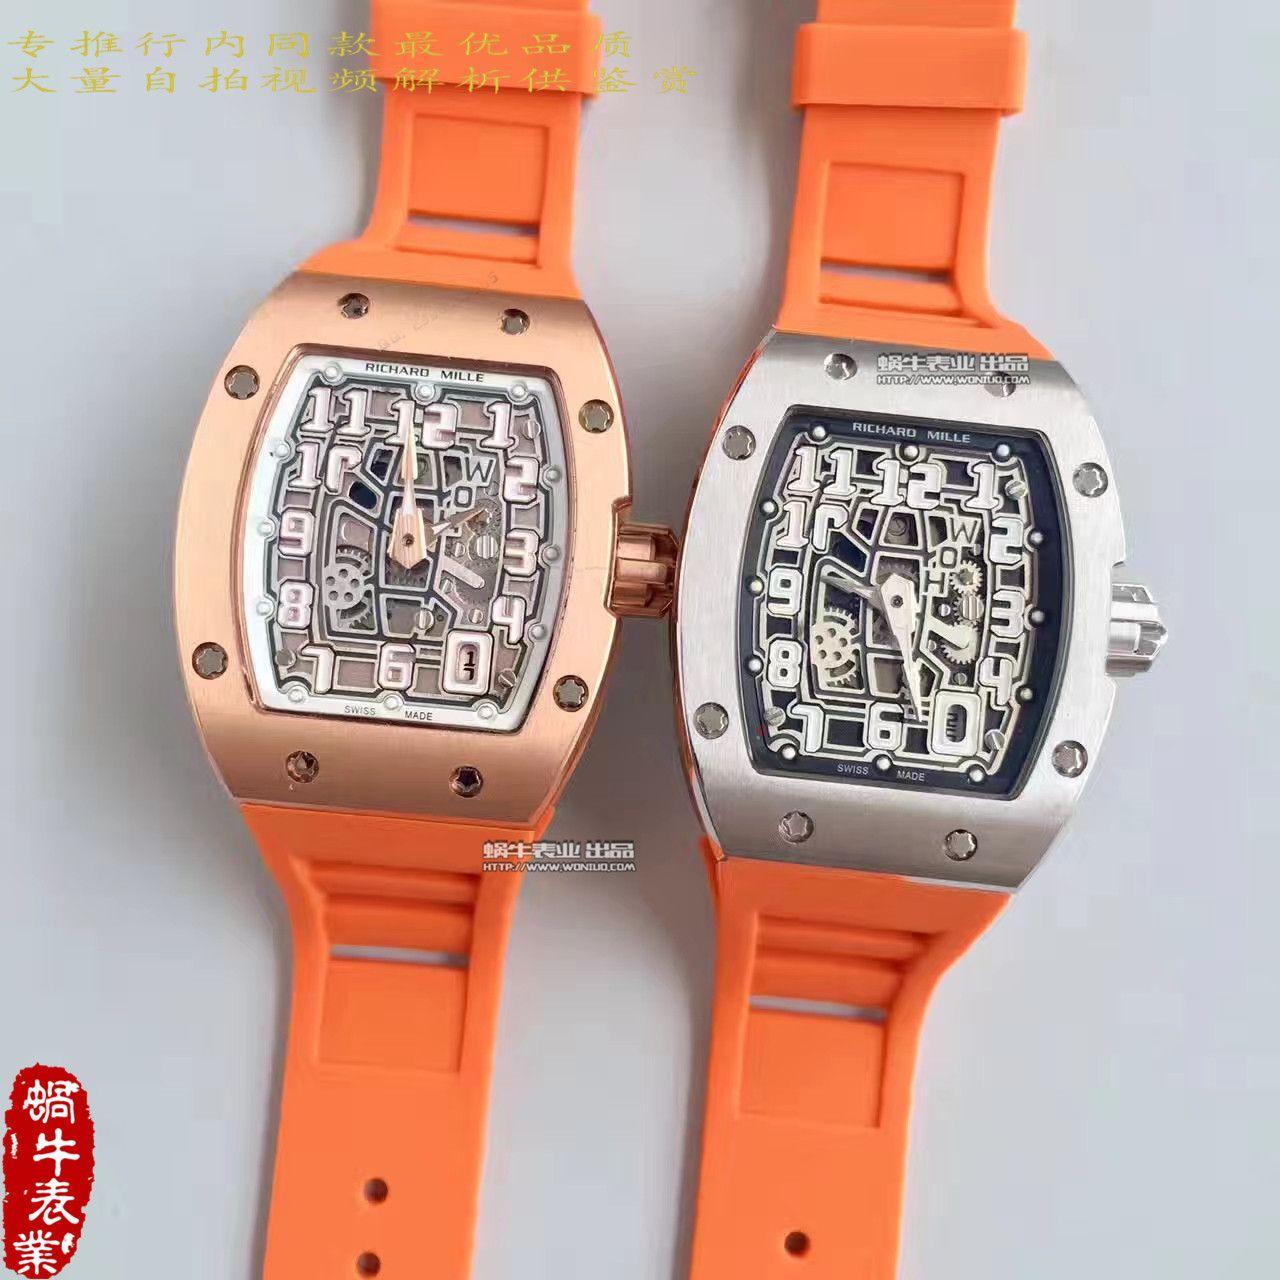 【LE厂一比一超A精仿手表】理查德.米勒男士系列RM 67-01Ti腕表 / RM67-01Ti